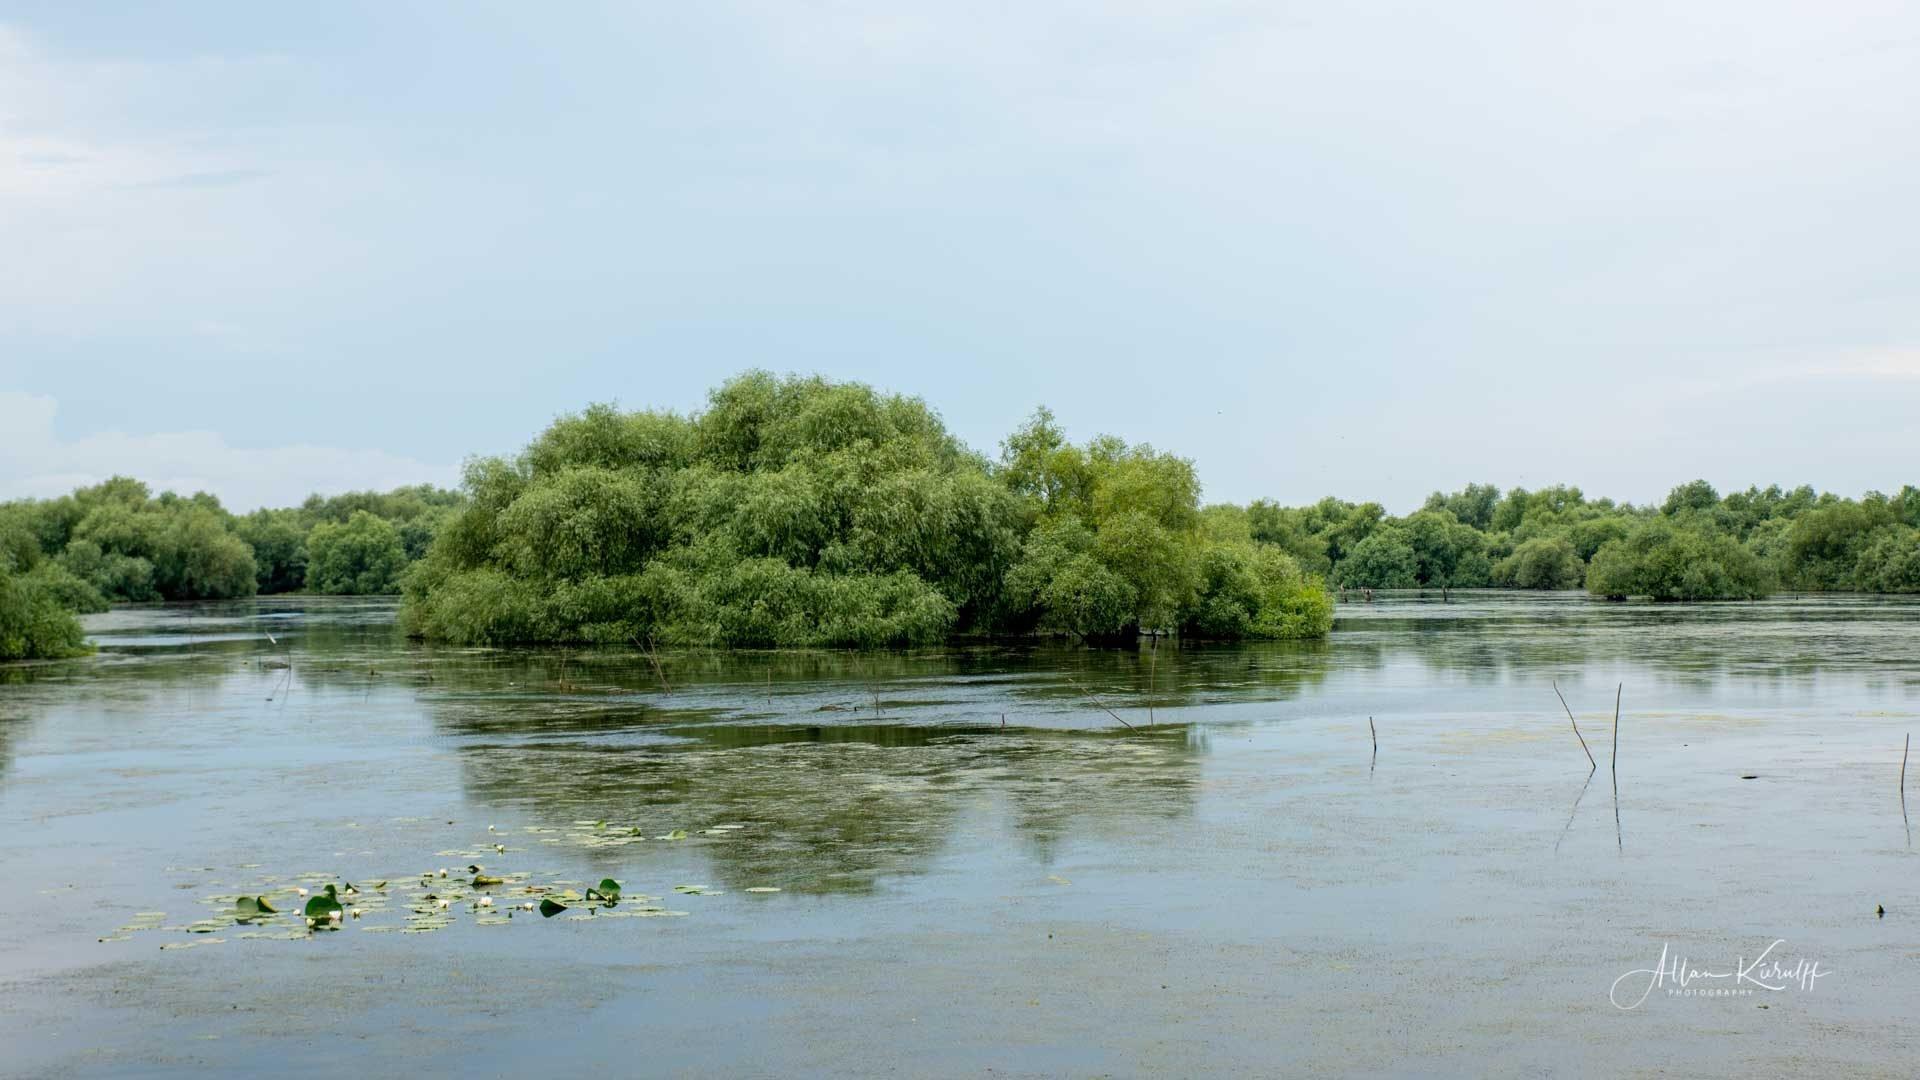 Donau Deltaet 40